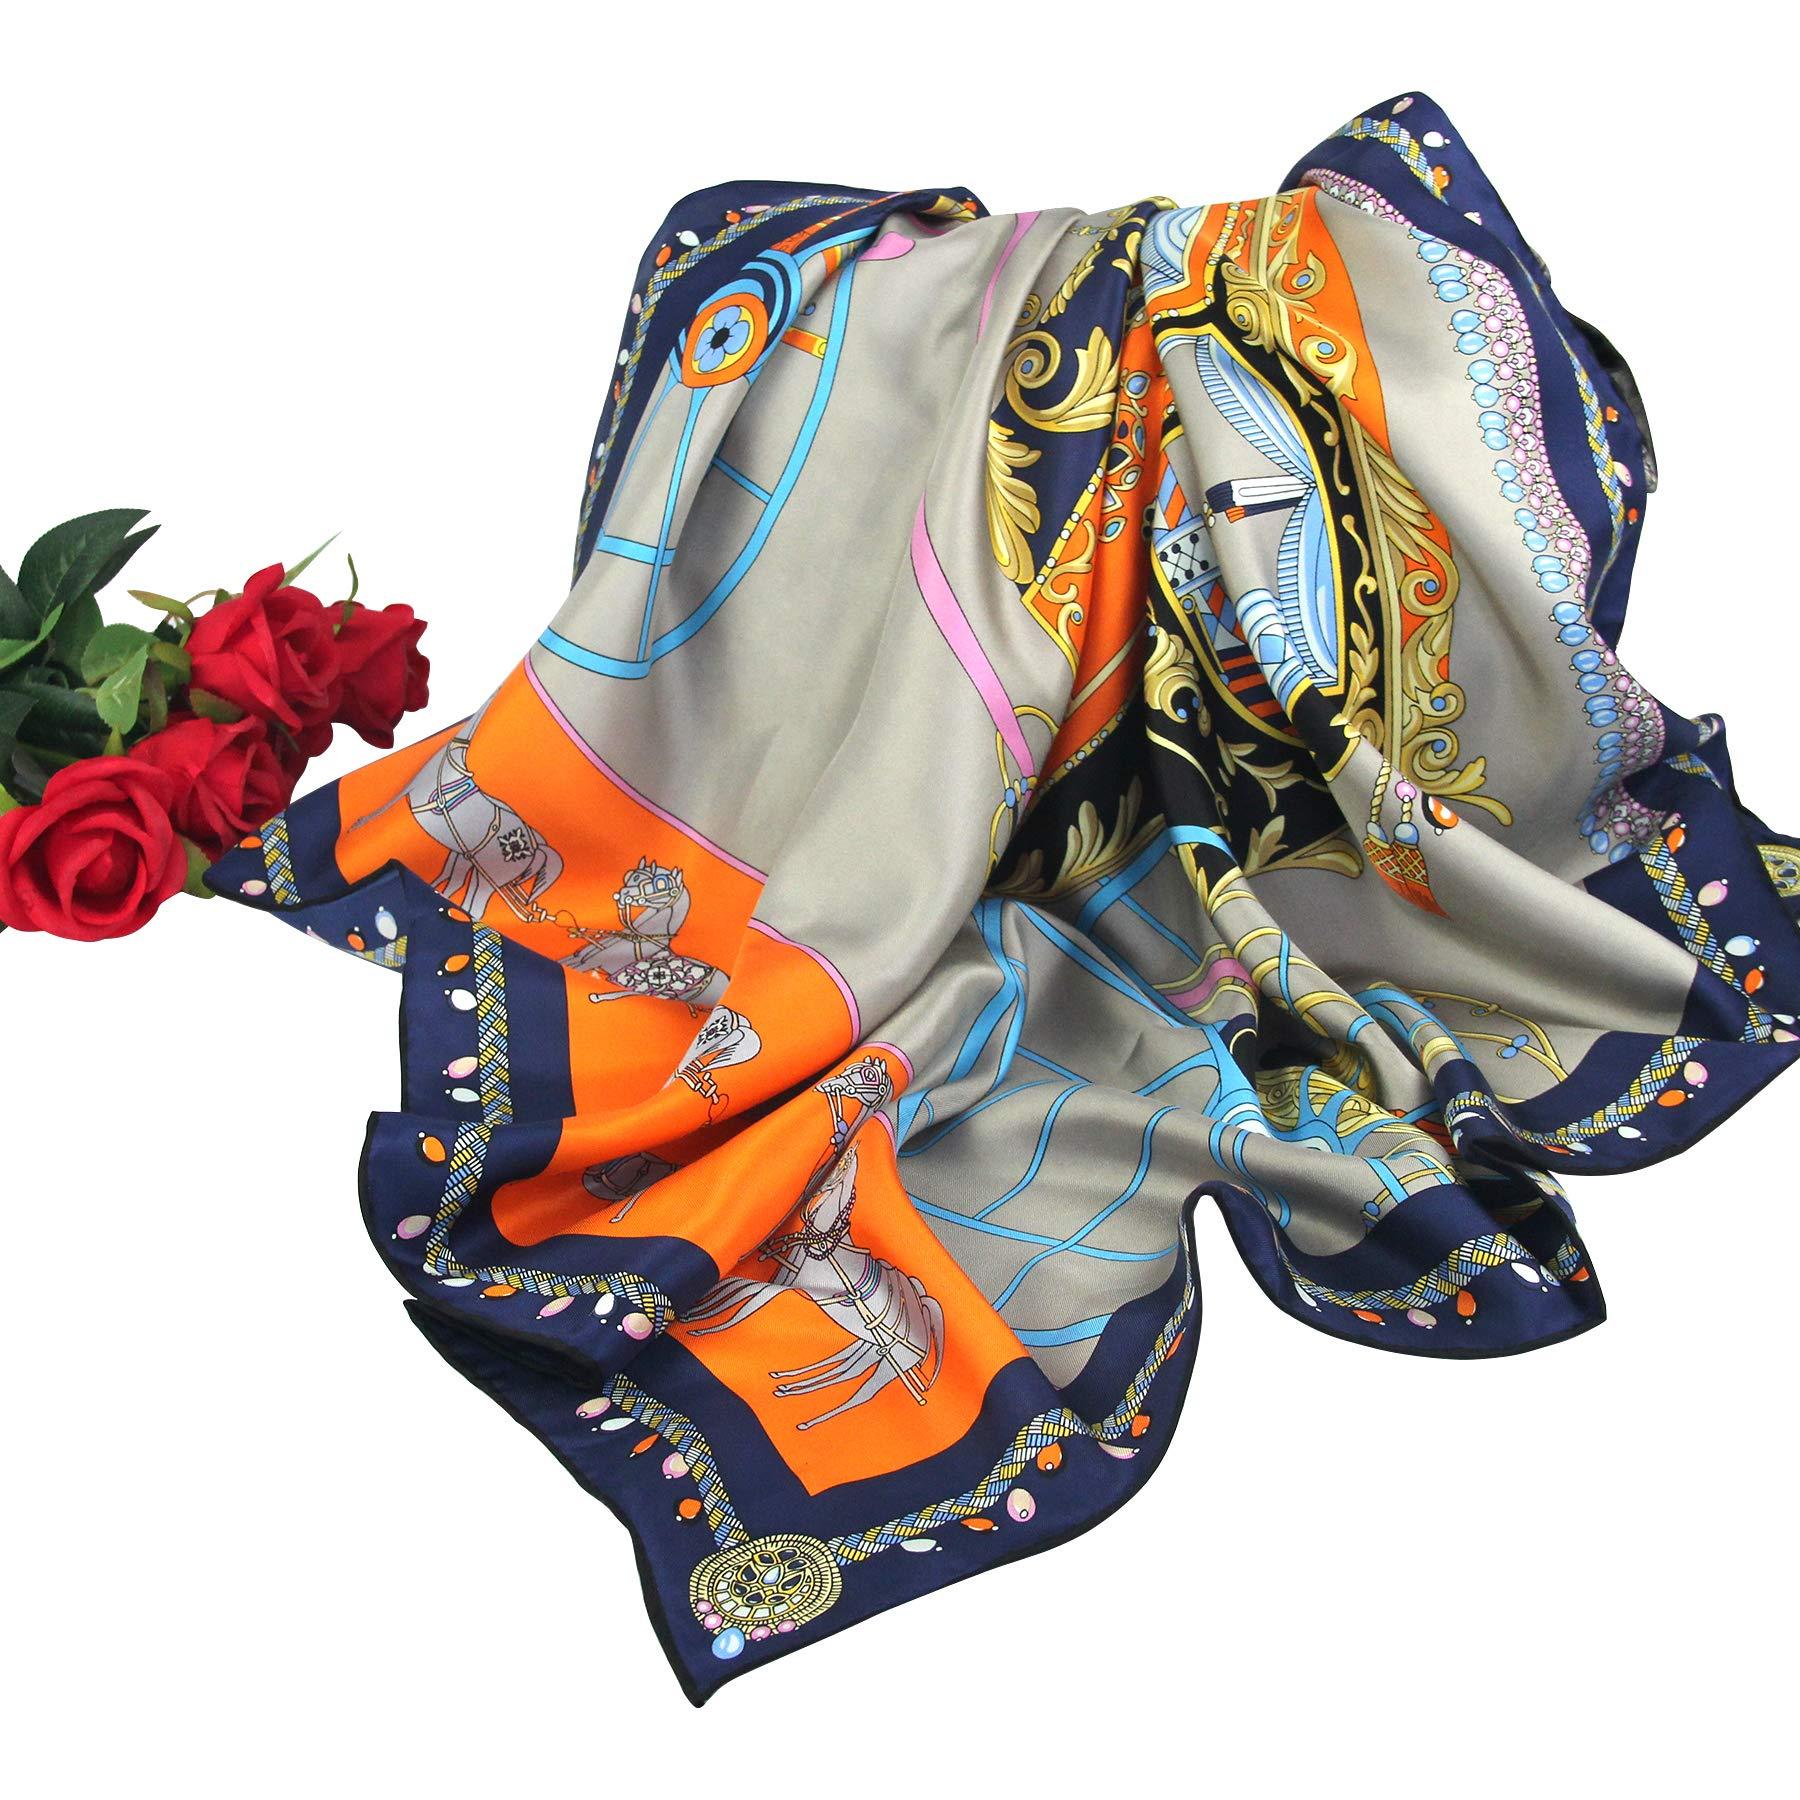 Muberry SilkTexture Barocco Scarves-Pantonight Pure Silk 14MM Hand Rolling Edge Silk Twill Scarf for Women (GREY 401)